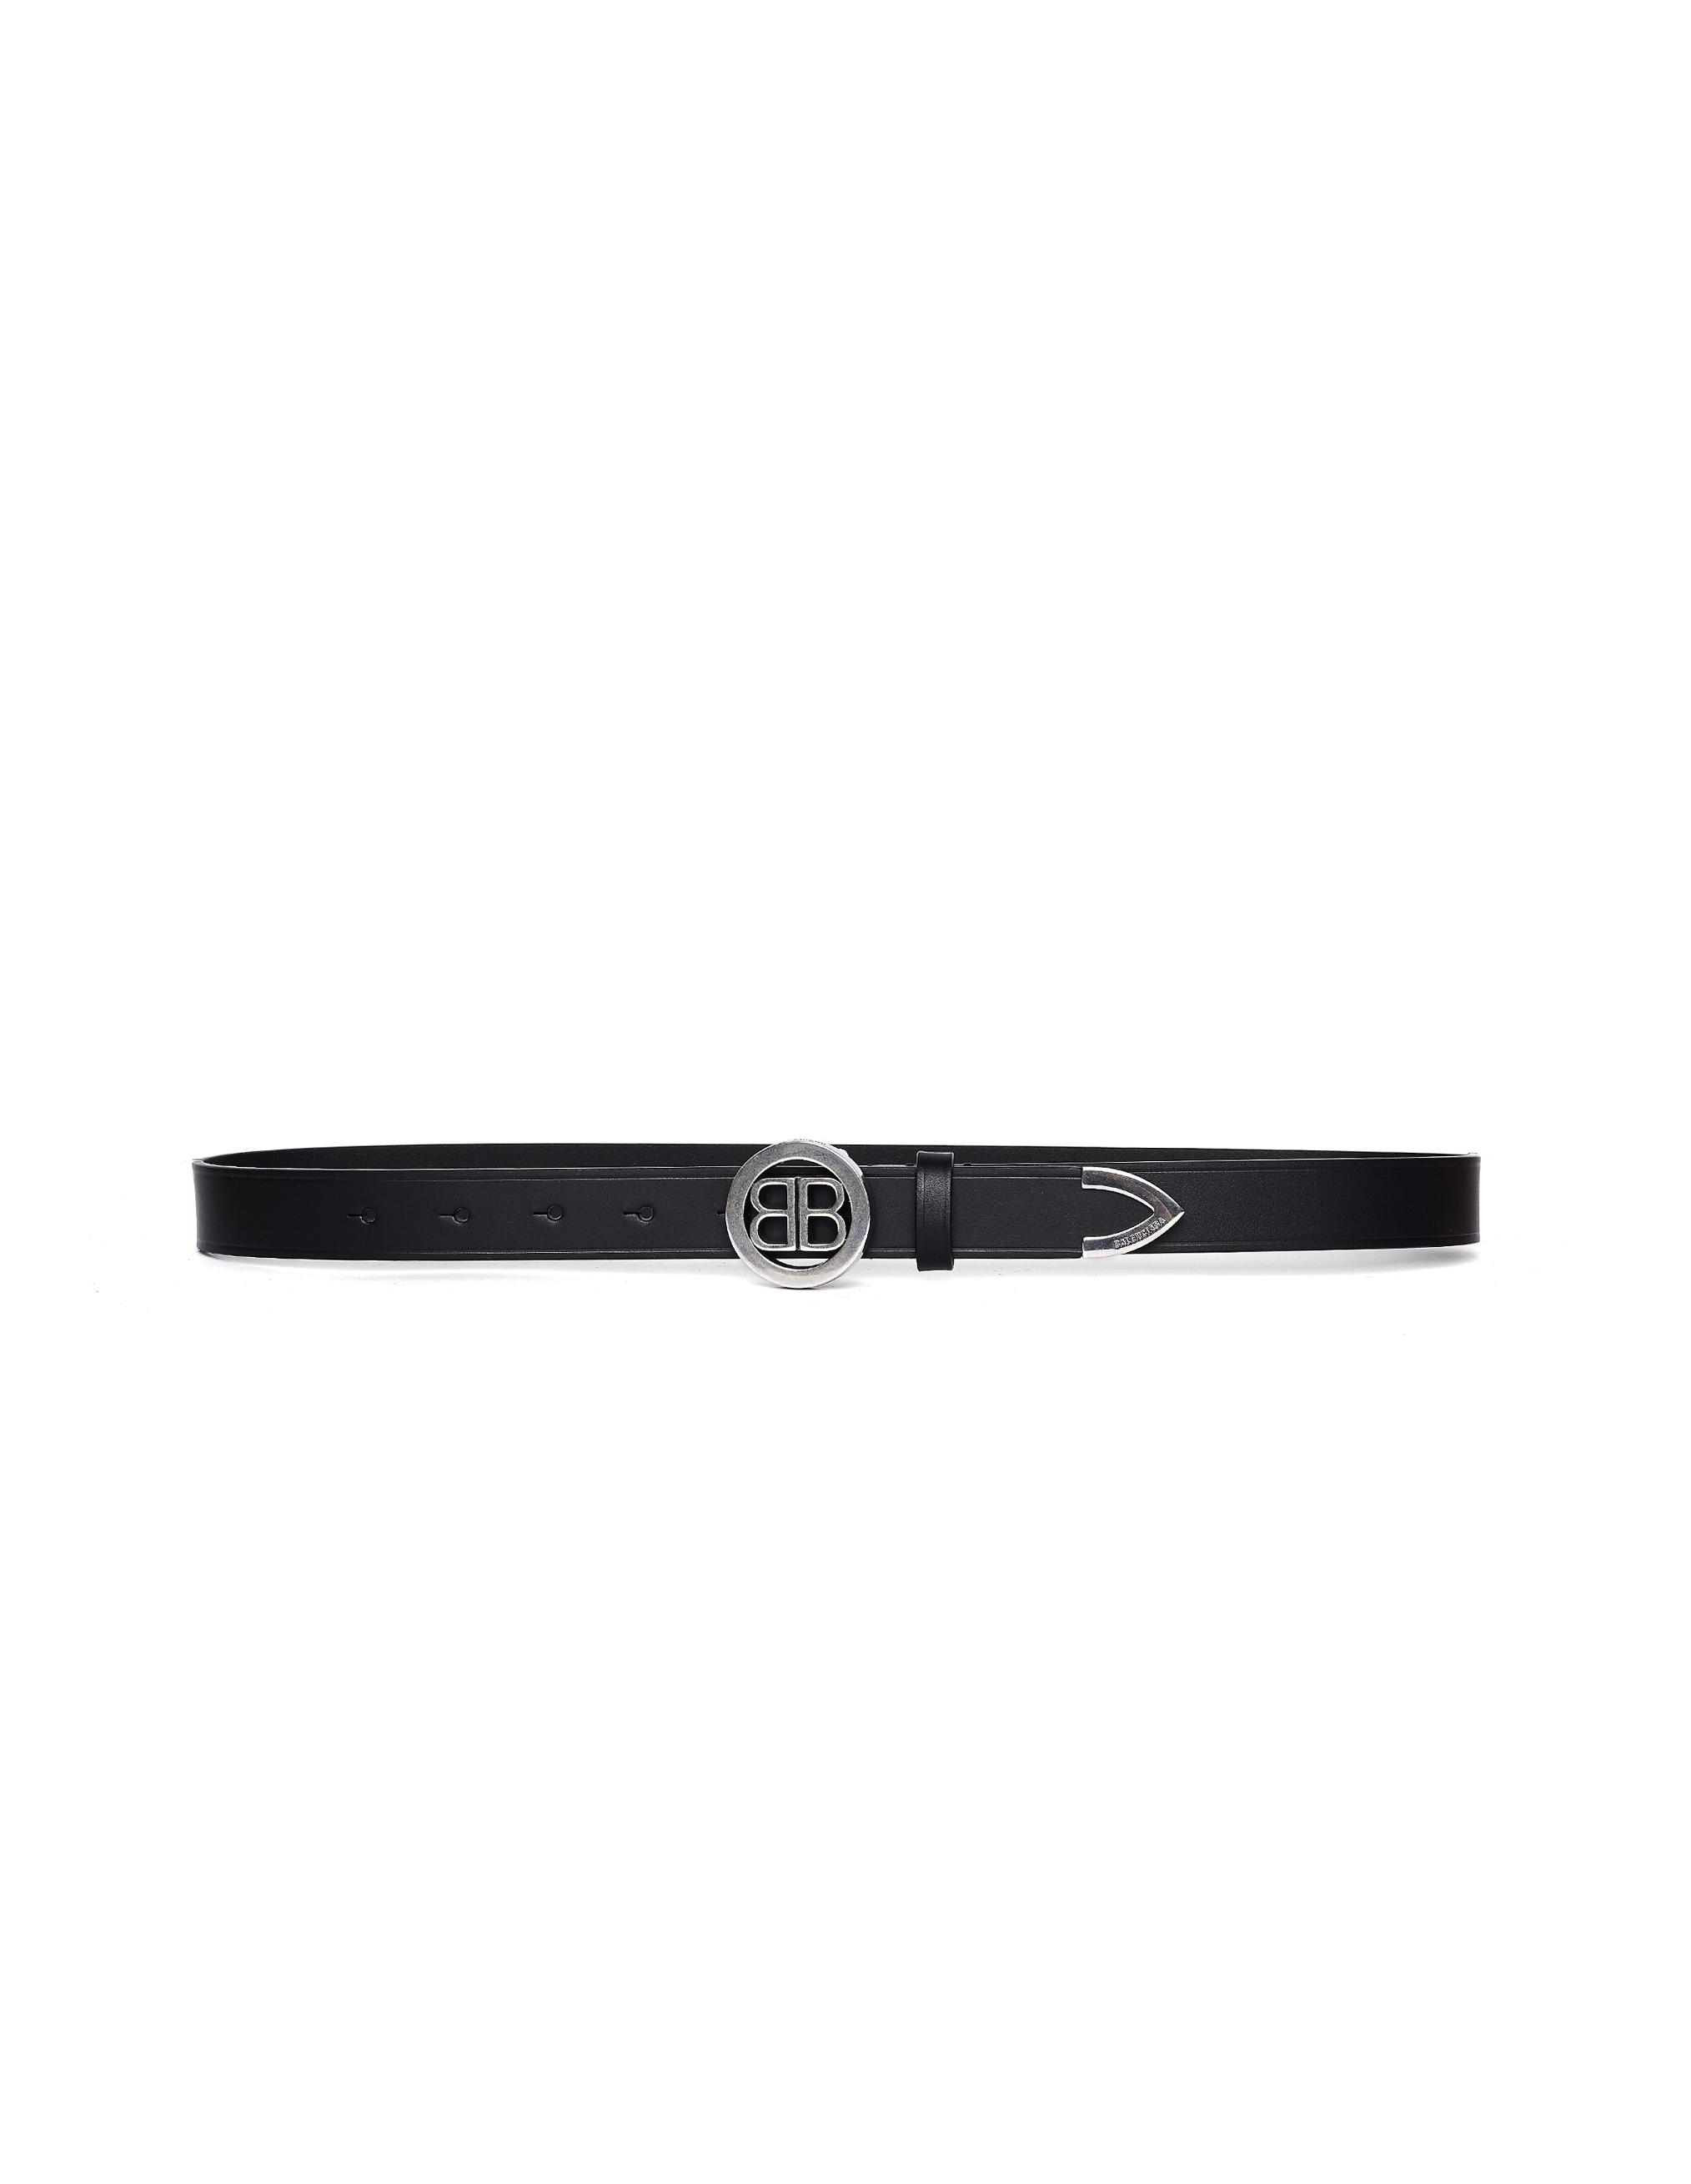 Balenciaga Black Leather ВВ Belt